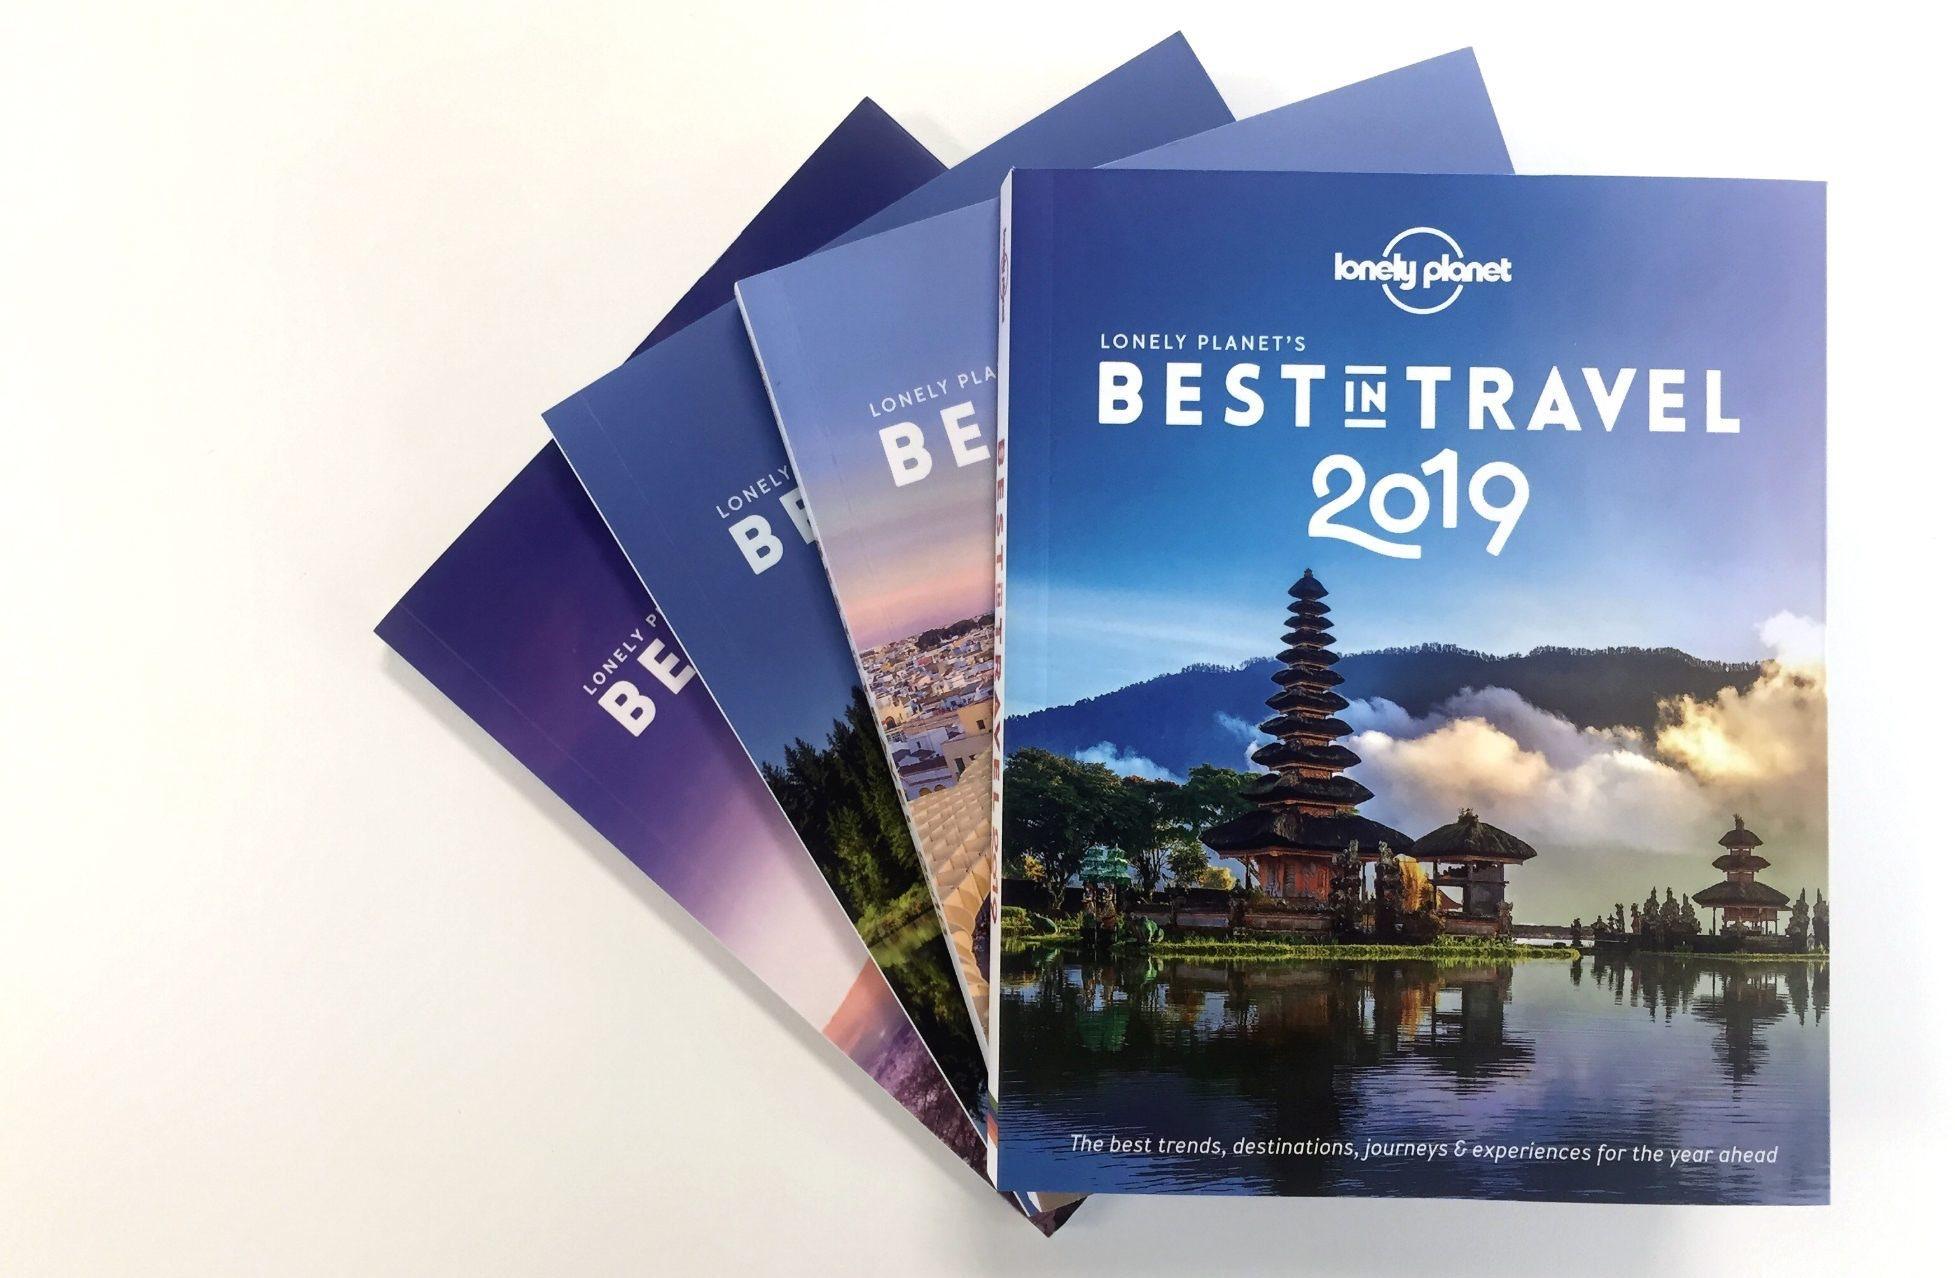 Best-in-travel-215c05b06916-e1537272359815